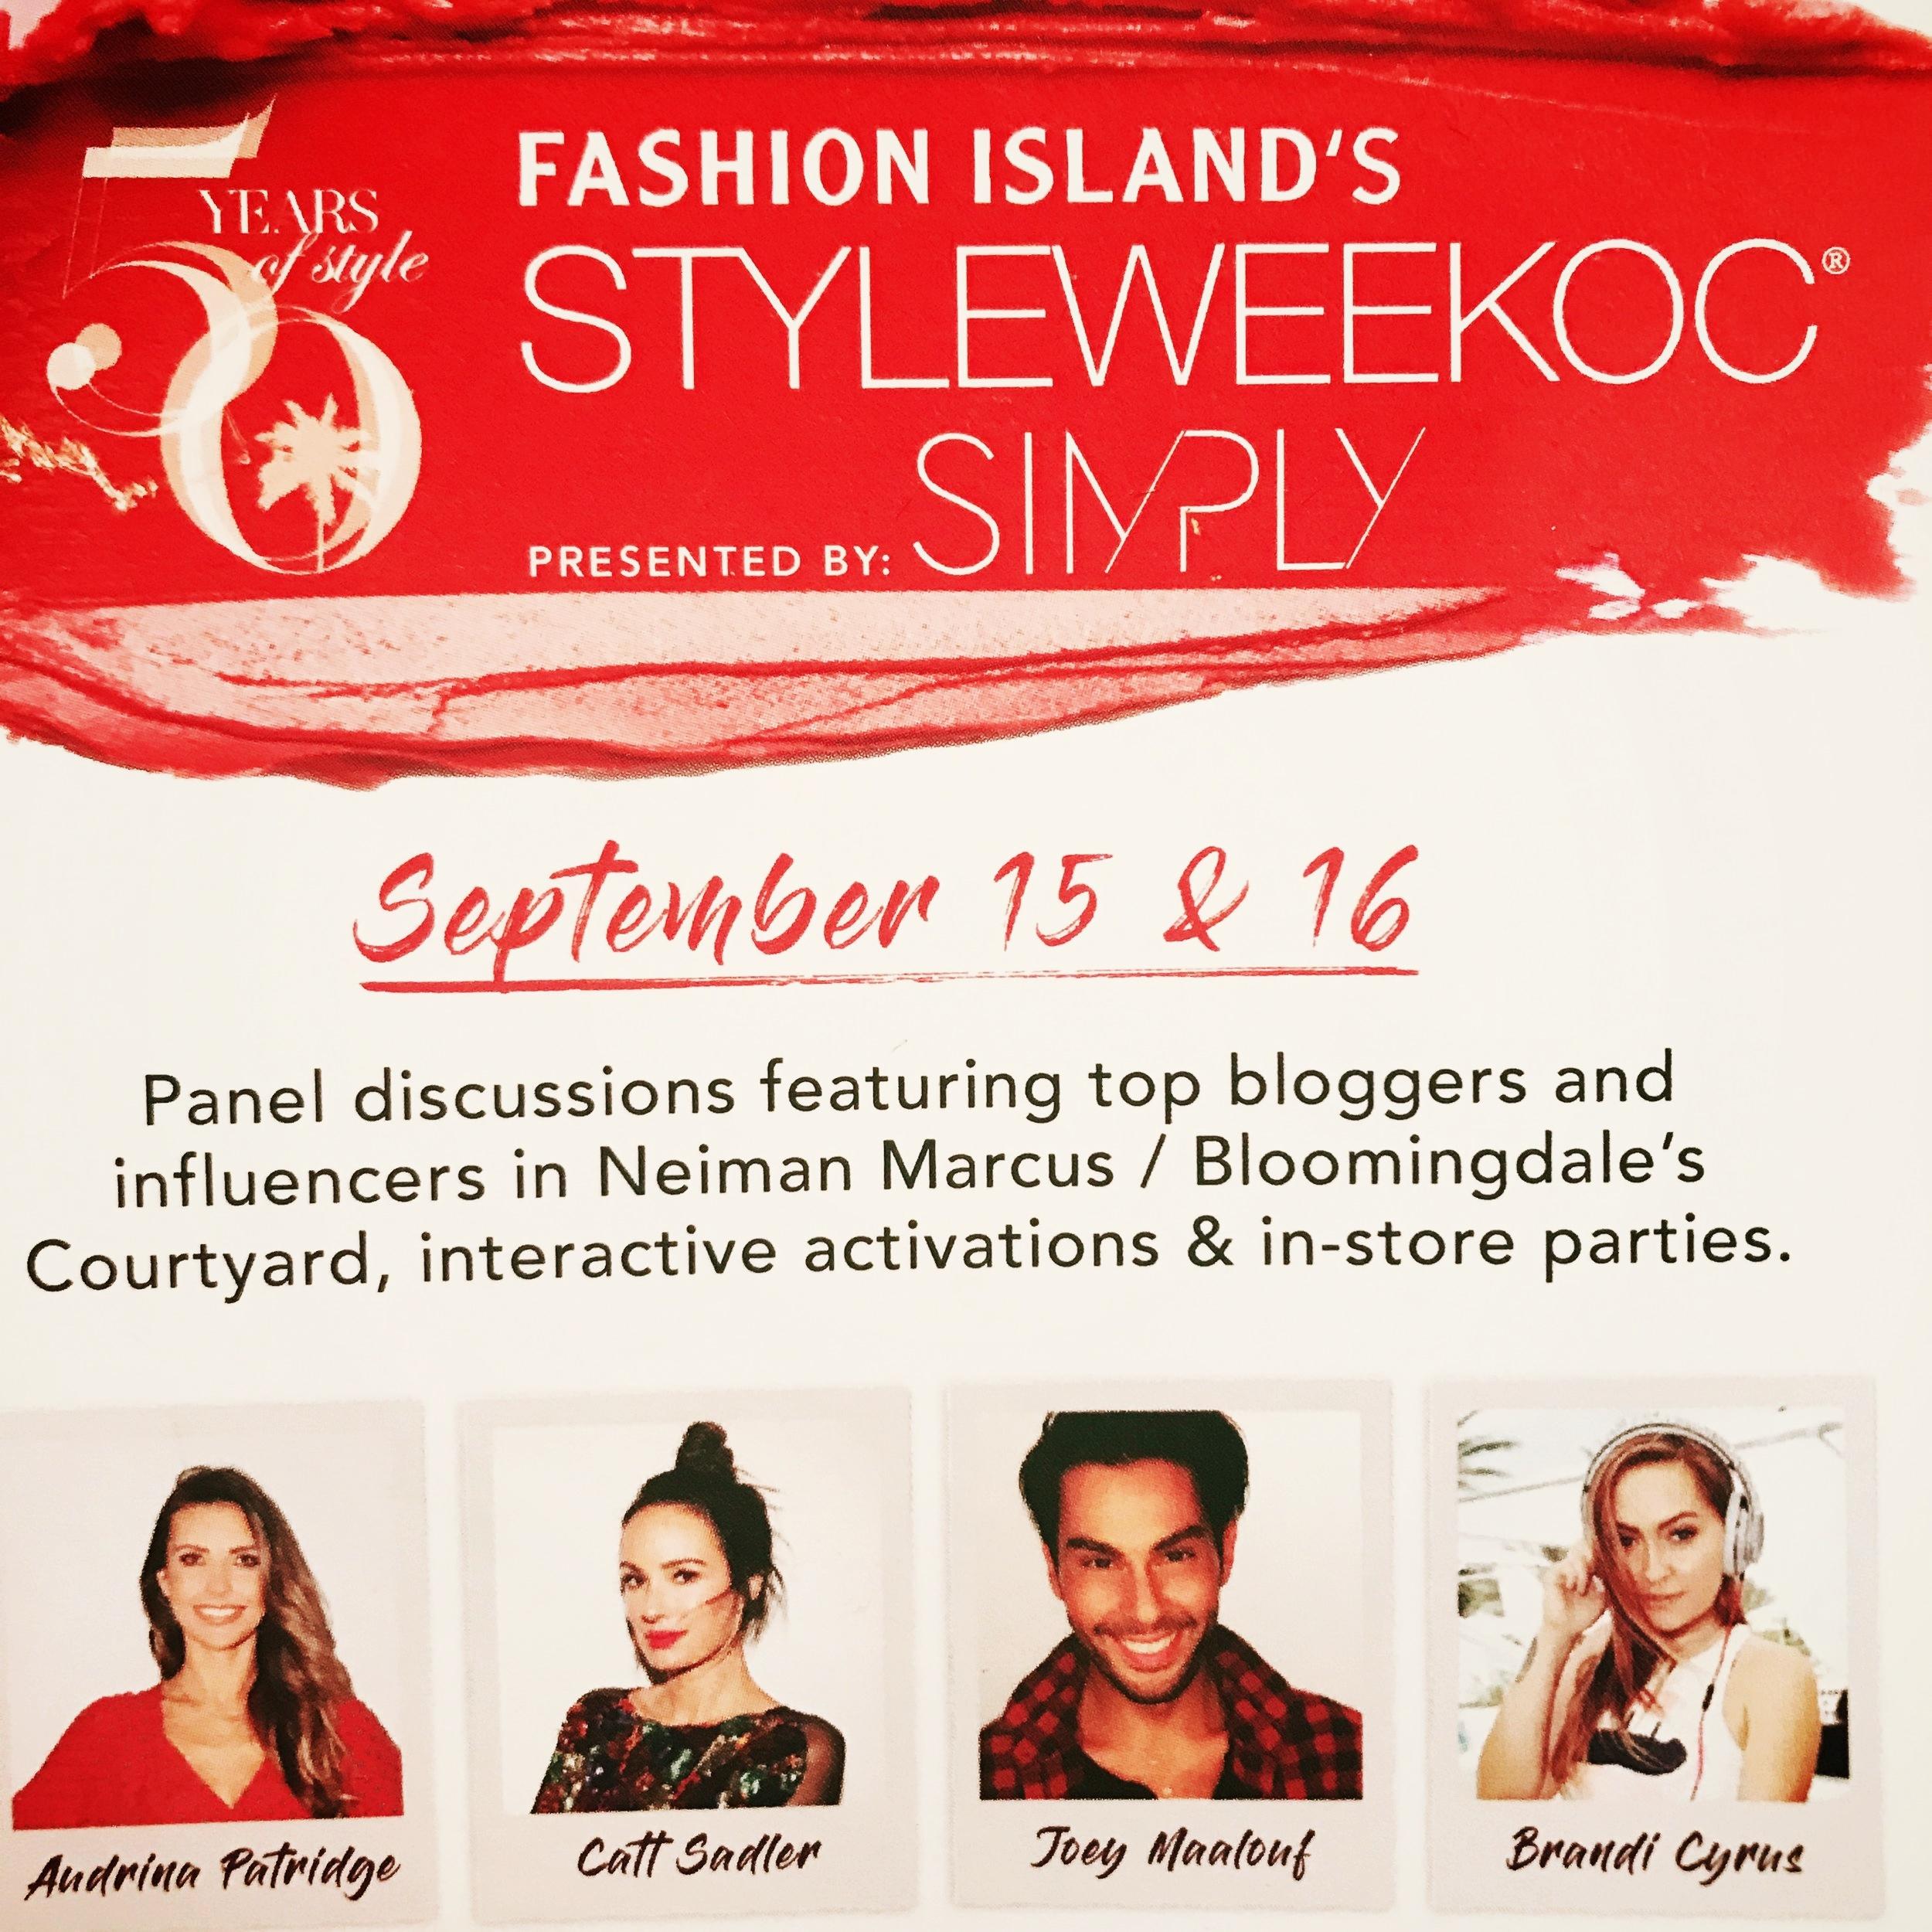 style-week-oc.jpg